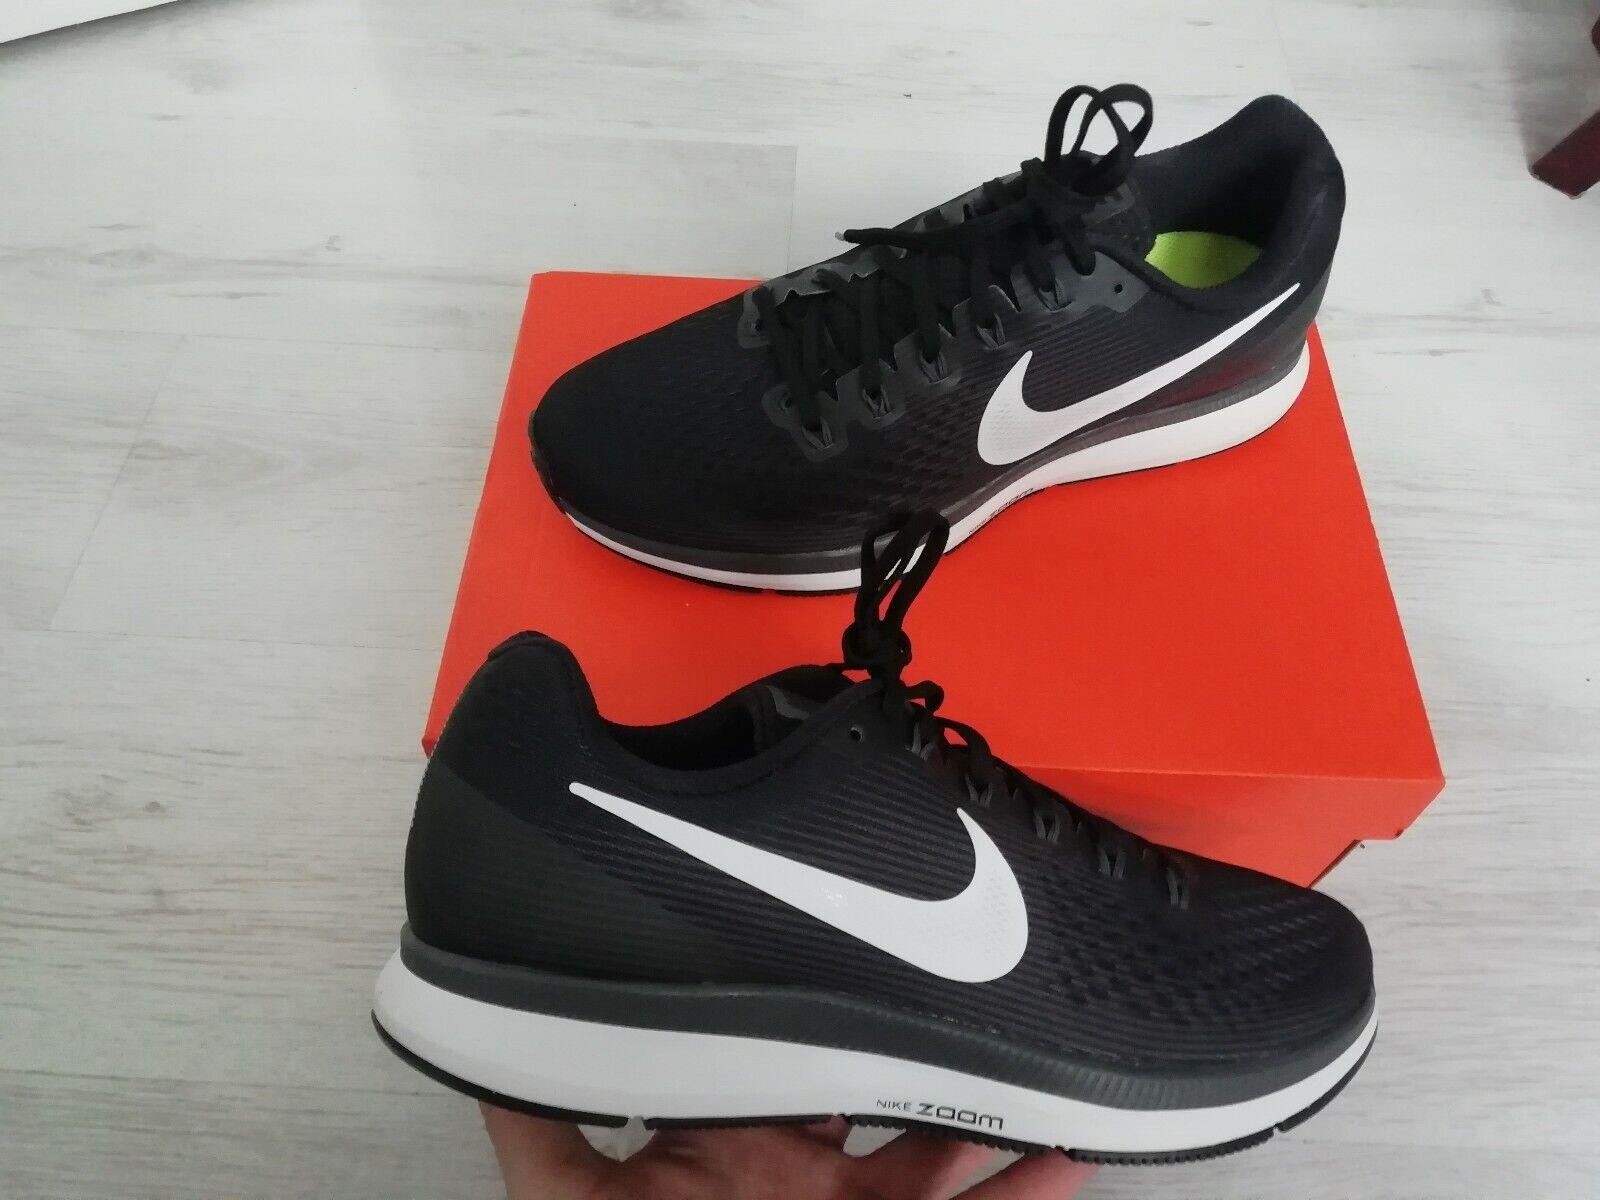 Nike Air Zoom Pegasus 34 Uomo Scarpe Da Corsa Taglia UK11 EUR46 880555 001